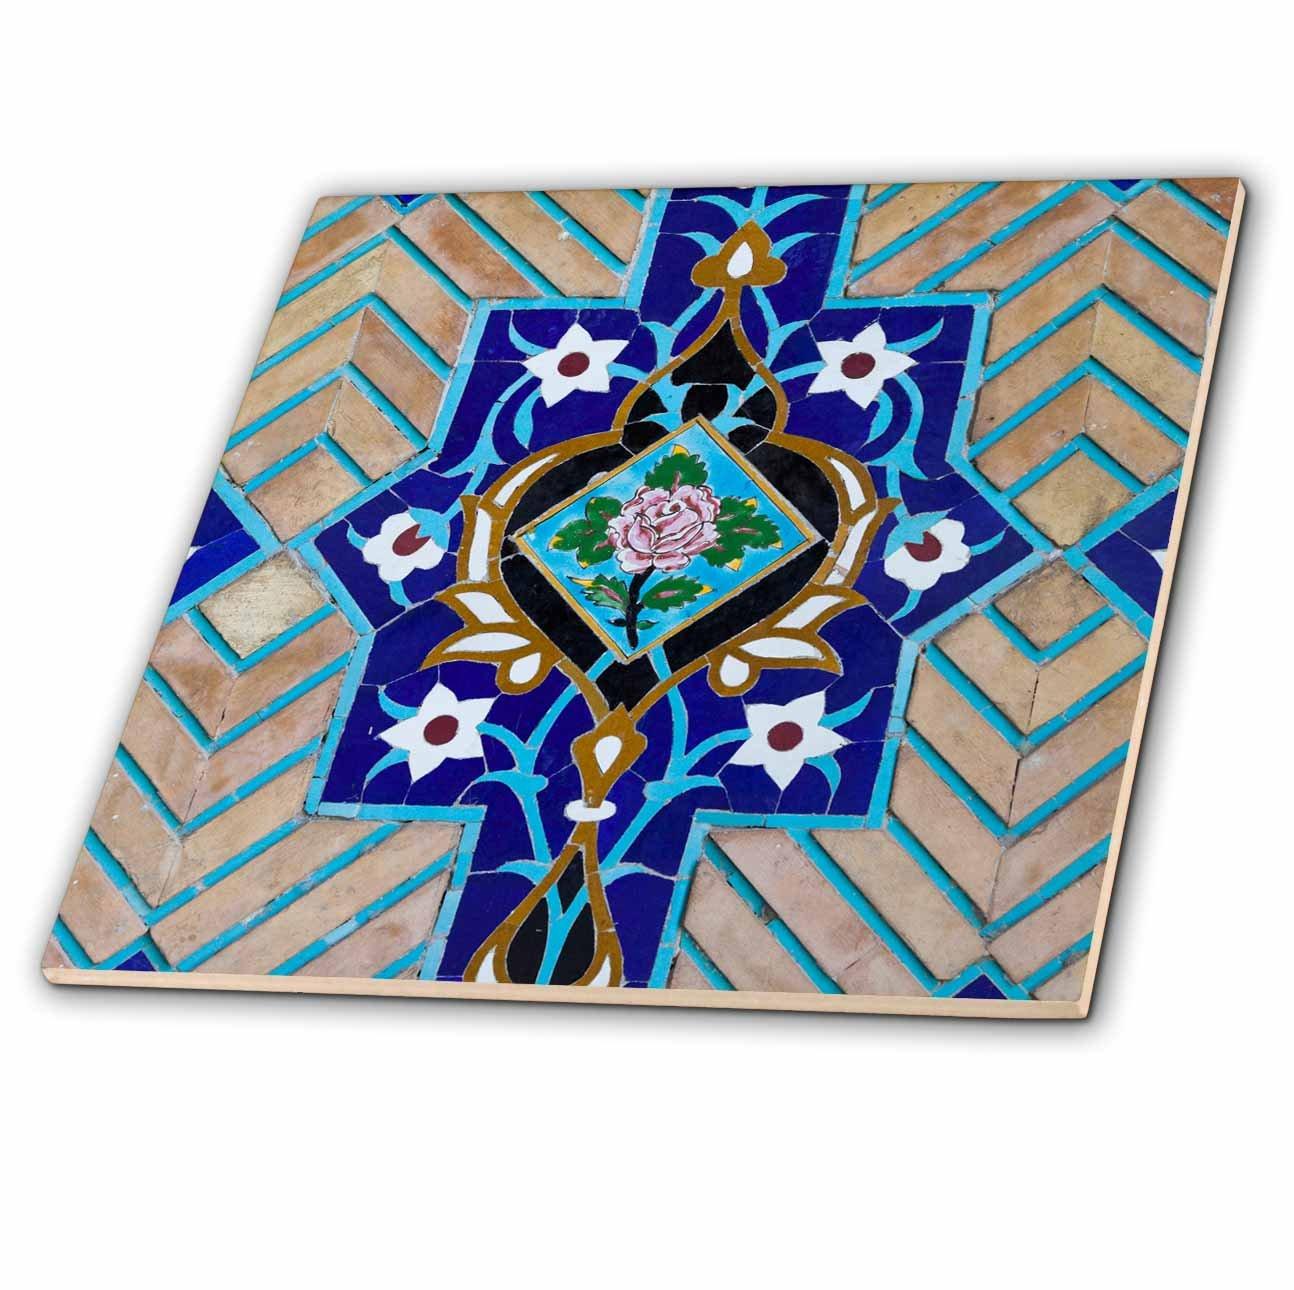 3dRose Danita Delimont - Artwork - Iran, Tehran, Niyavaran Palace Complex, Palace Of The Last Shah. - 8 Inch Glass Tile (ct_276823_7)